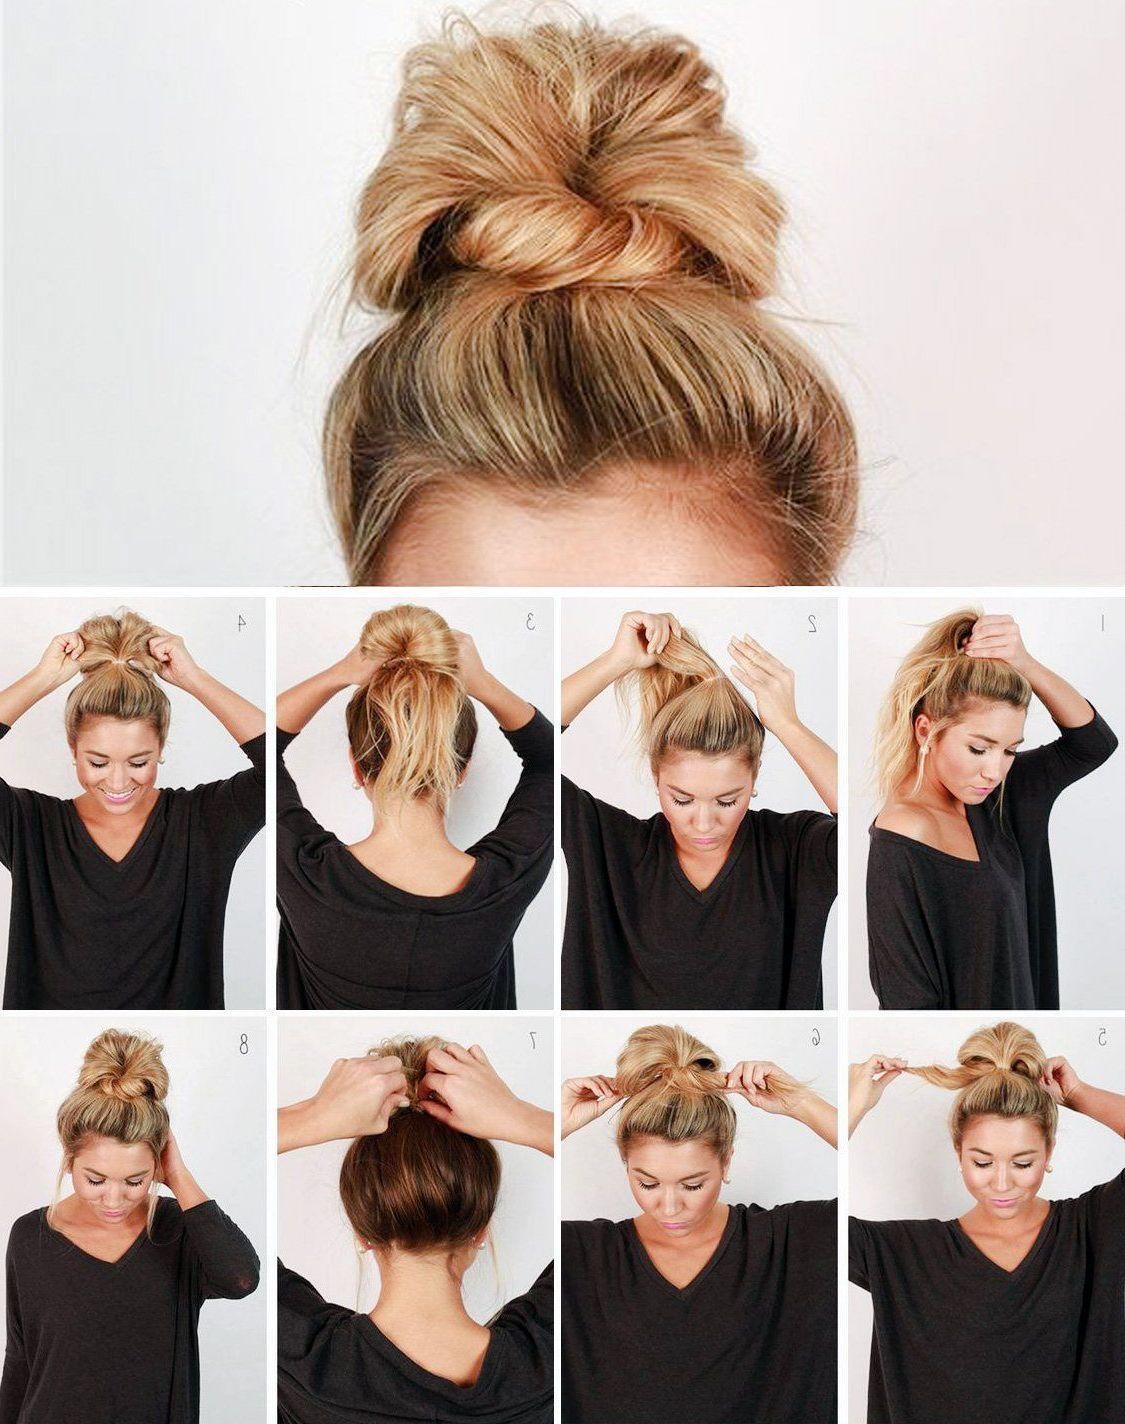 Einfache Frisuren Fur Den Alltag 40 Tolle Ideen Beauty Frisurentrends Zenideen Frisuren Lange Haare Alltag Frisuren Lange Haare Madchen Frisuren Lange Haare Anleitung